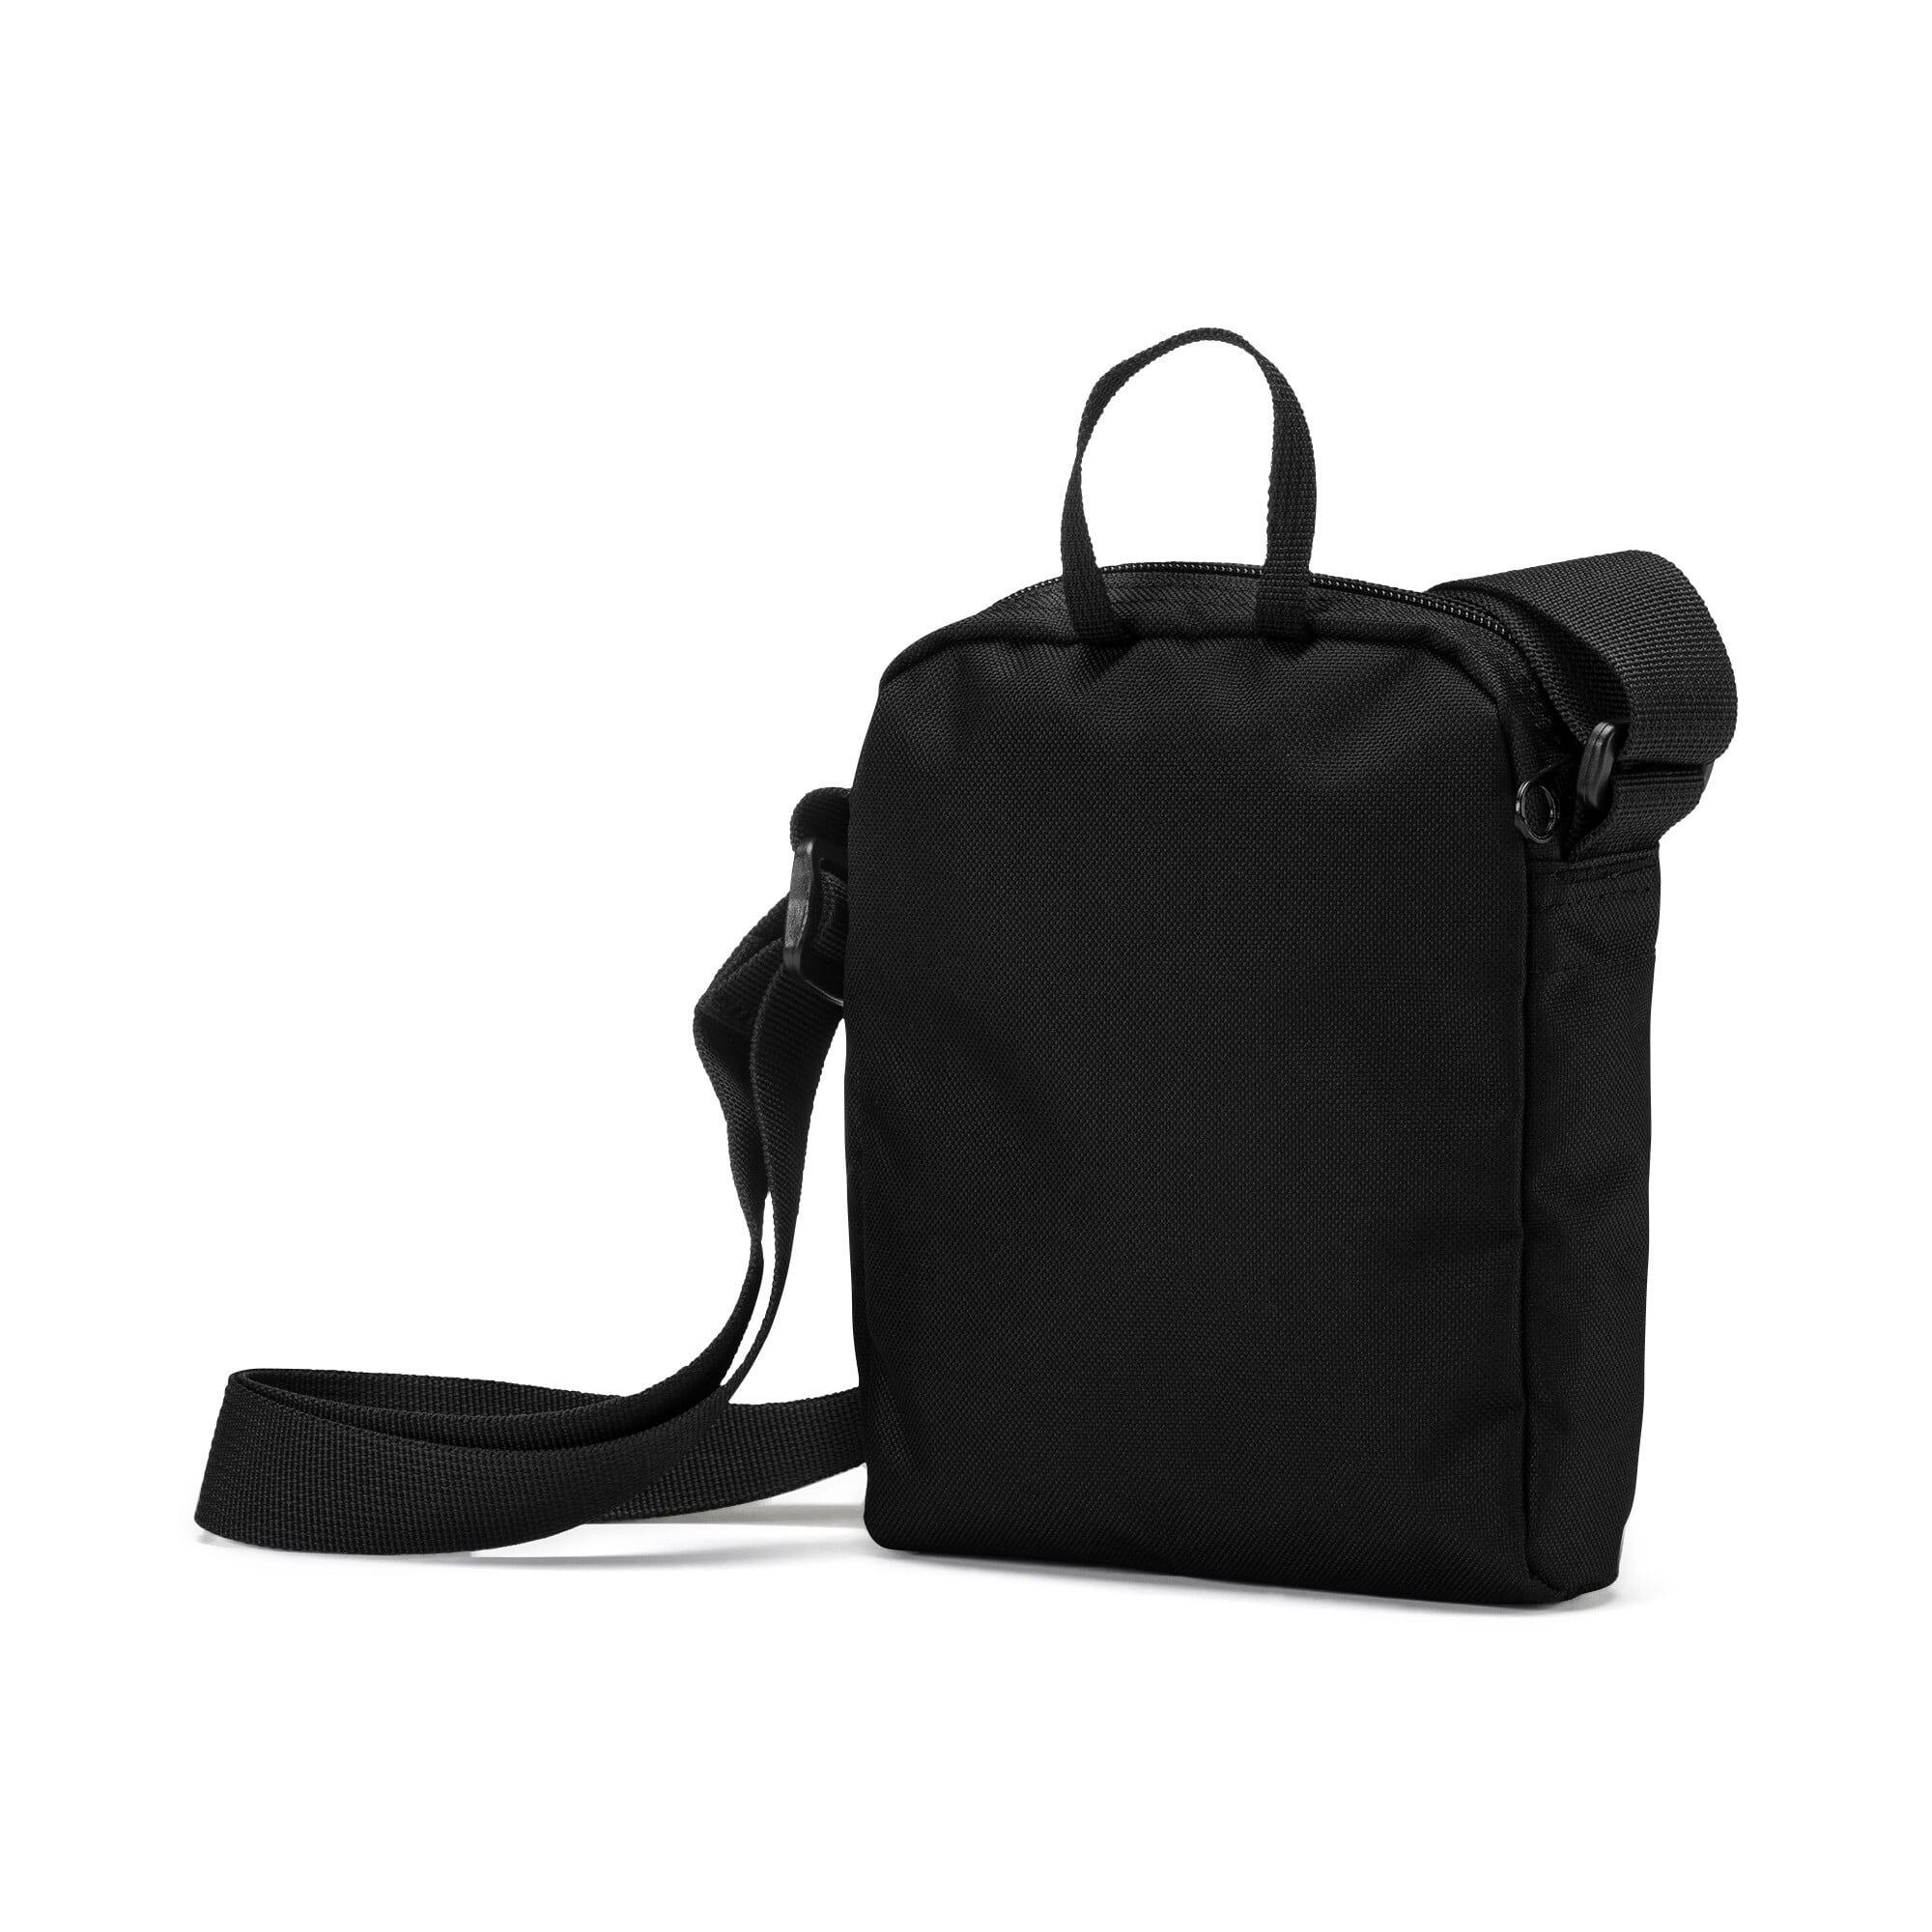 Thumbnail 2 of Valencia CF Portable City Bag, Puma Black-Puma White, medium